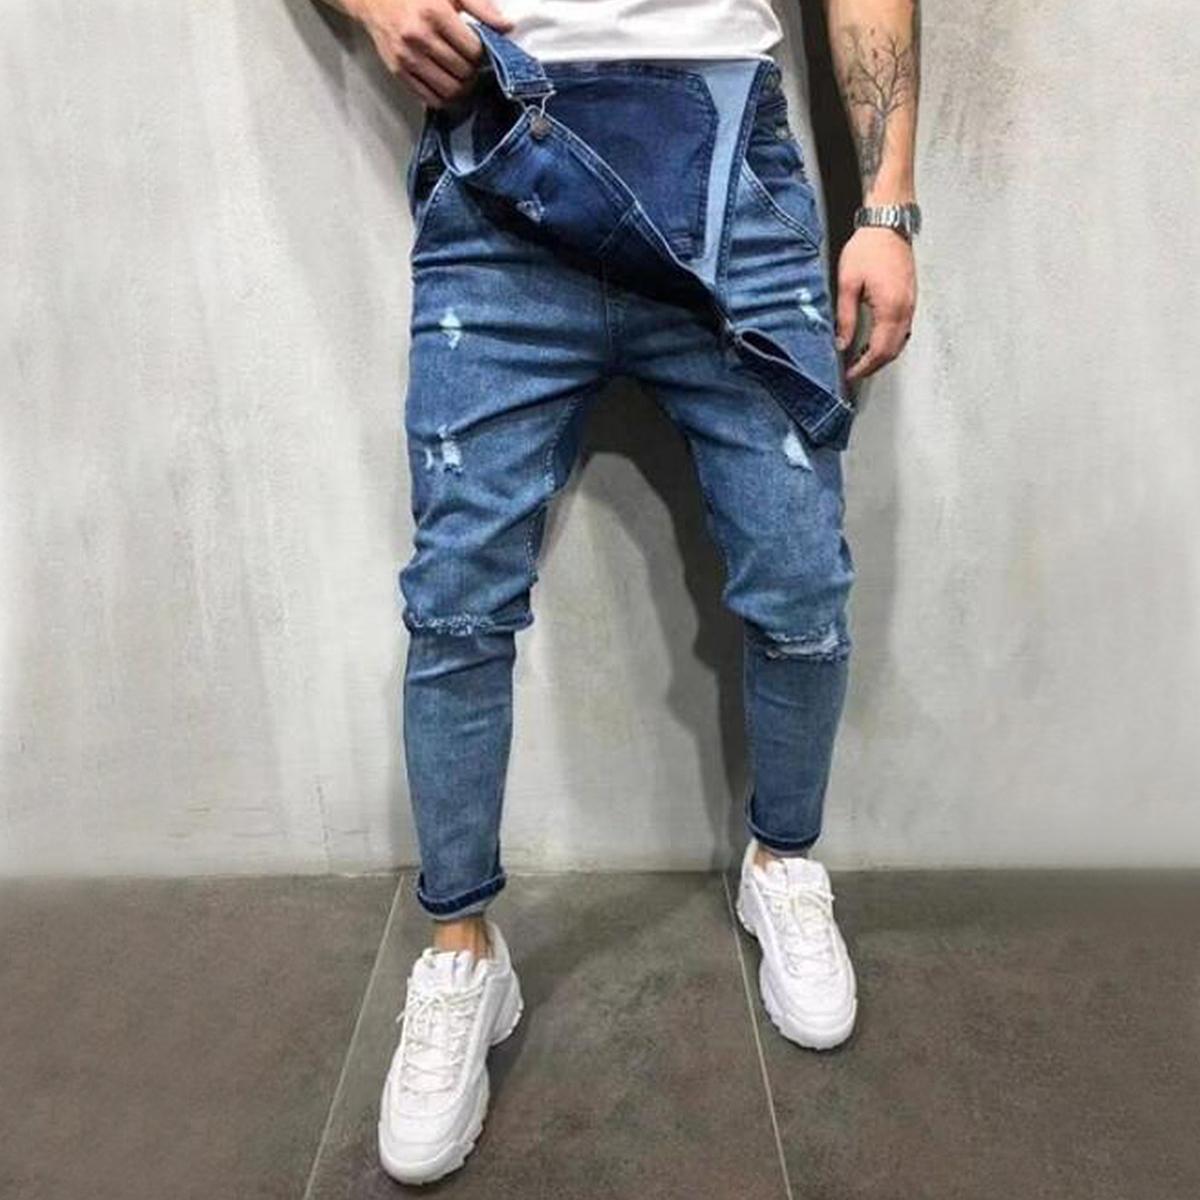 Correa-De-Hombre-Denim-Jeans-Mono-Mono-corto-Dungaree-Pantalones-Cortos-Deshilachados-Babero-En miniatura 22